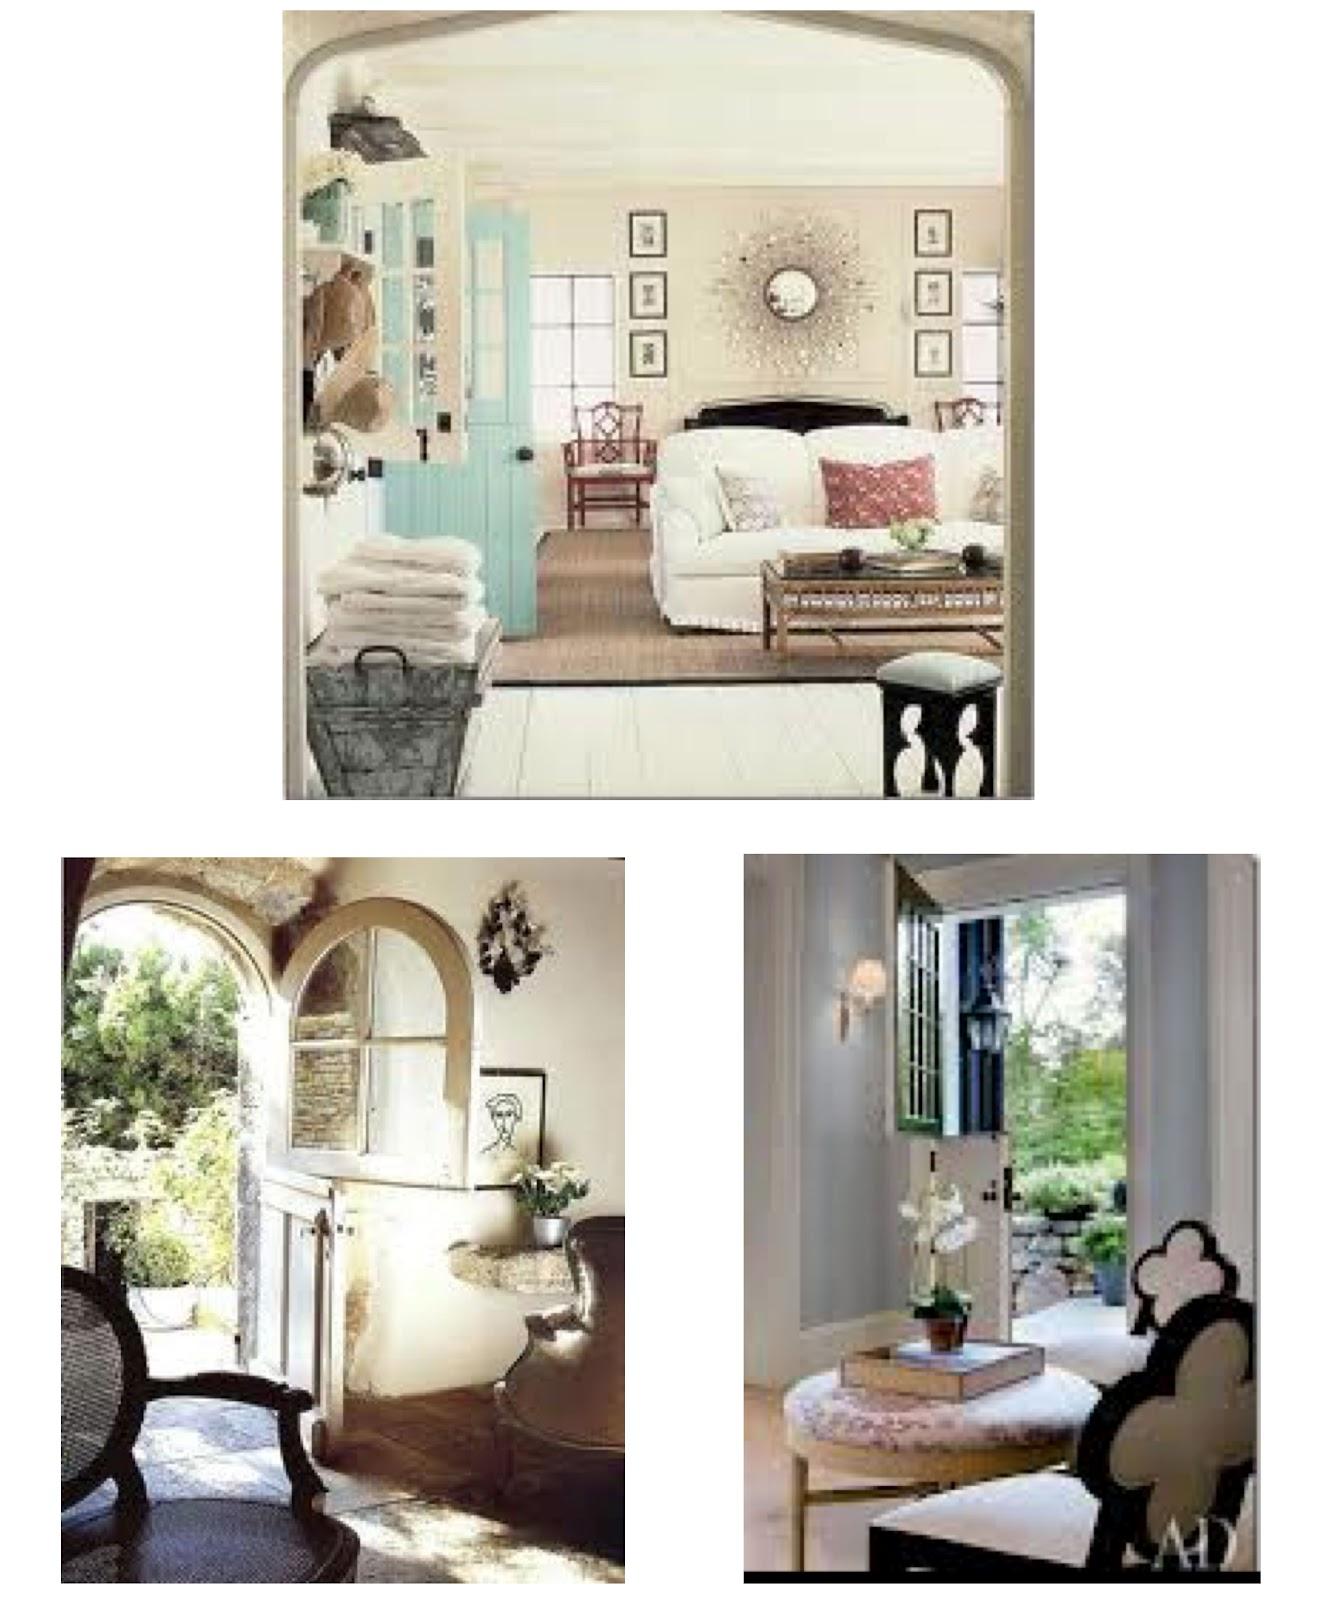 Designs by Rhonda: Front Door Friday!